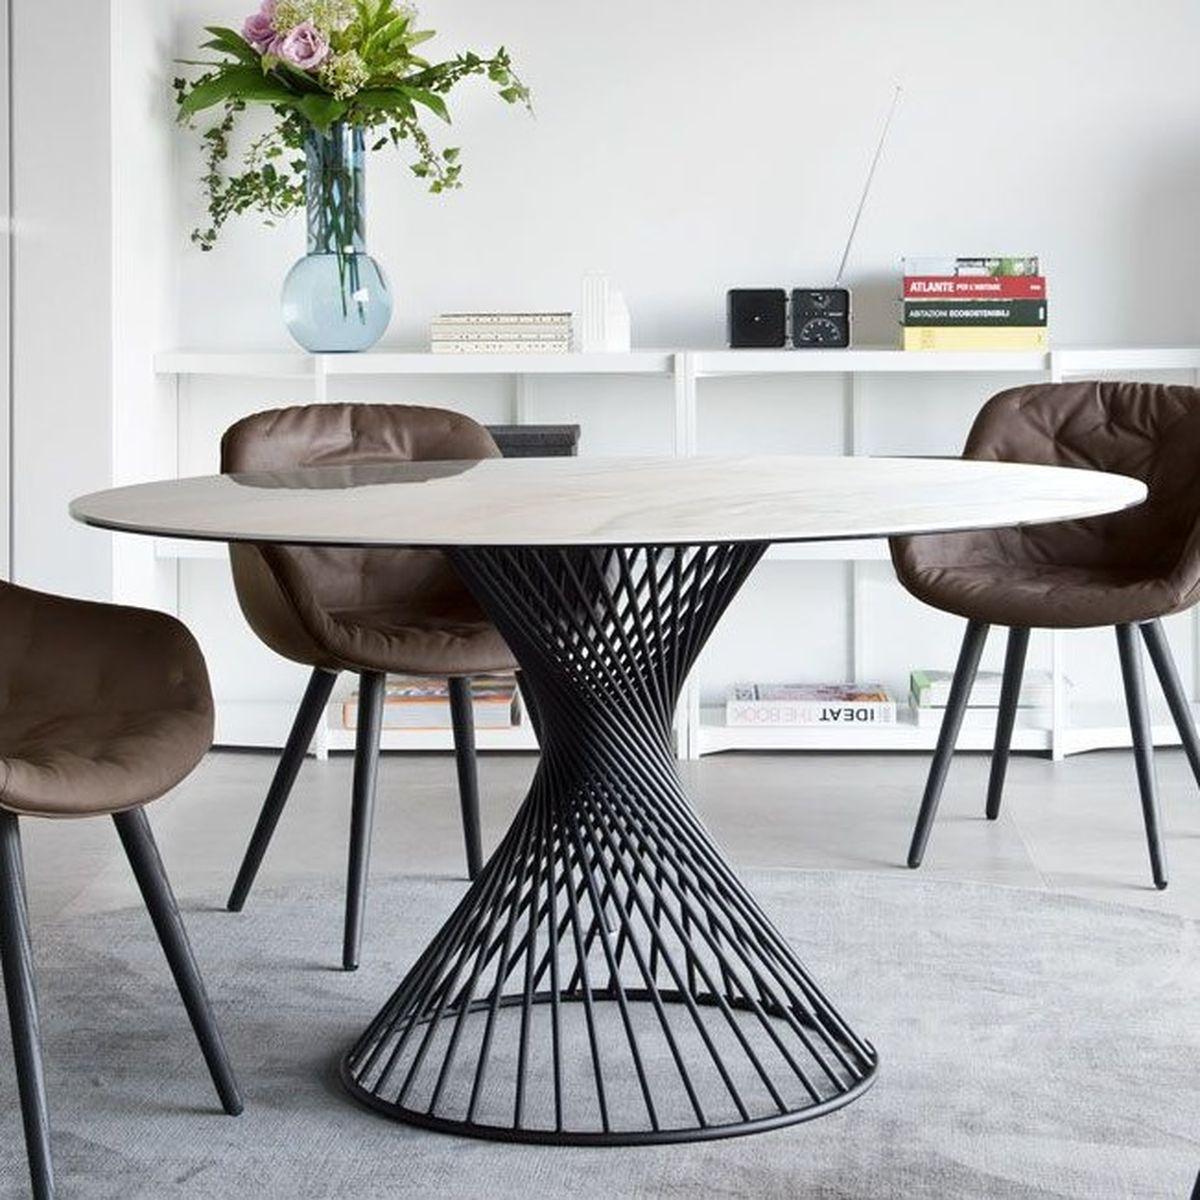 Table ronde VORTEX Calligaris céramique onix or